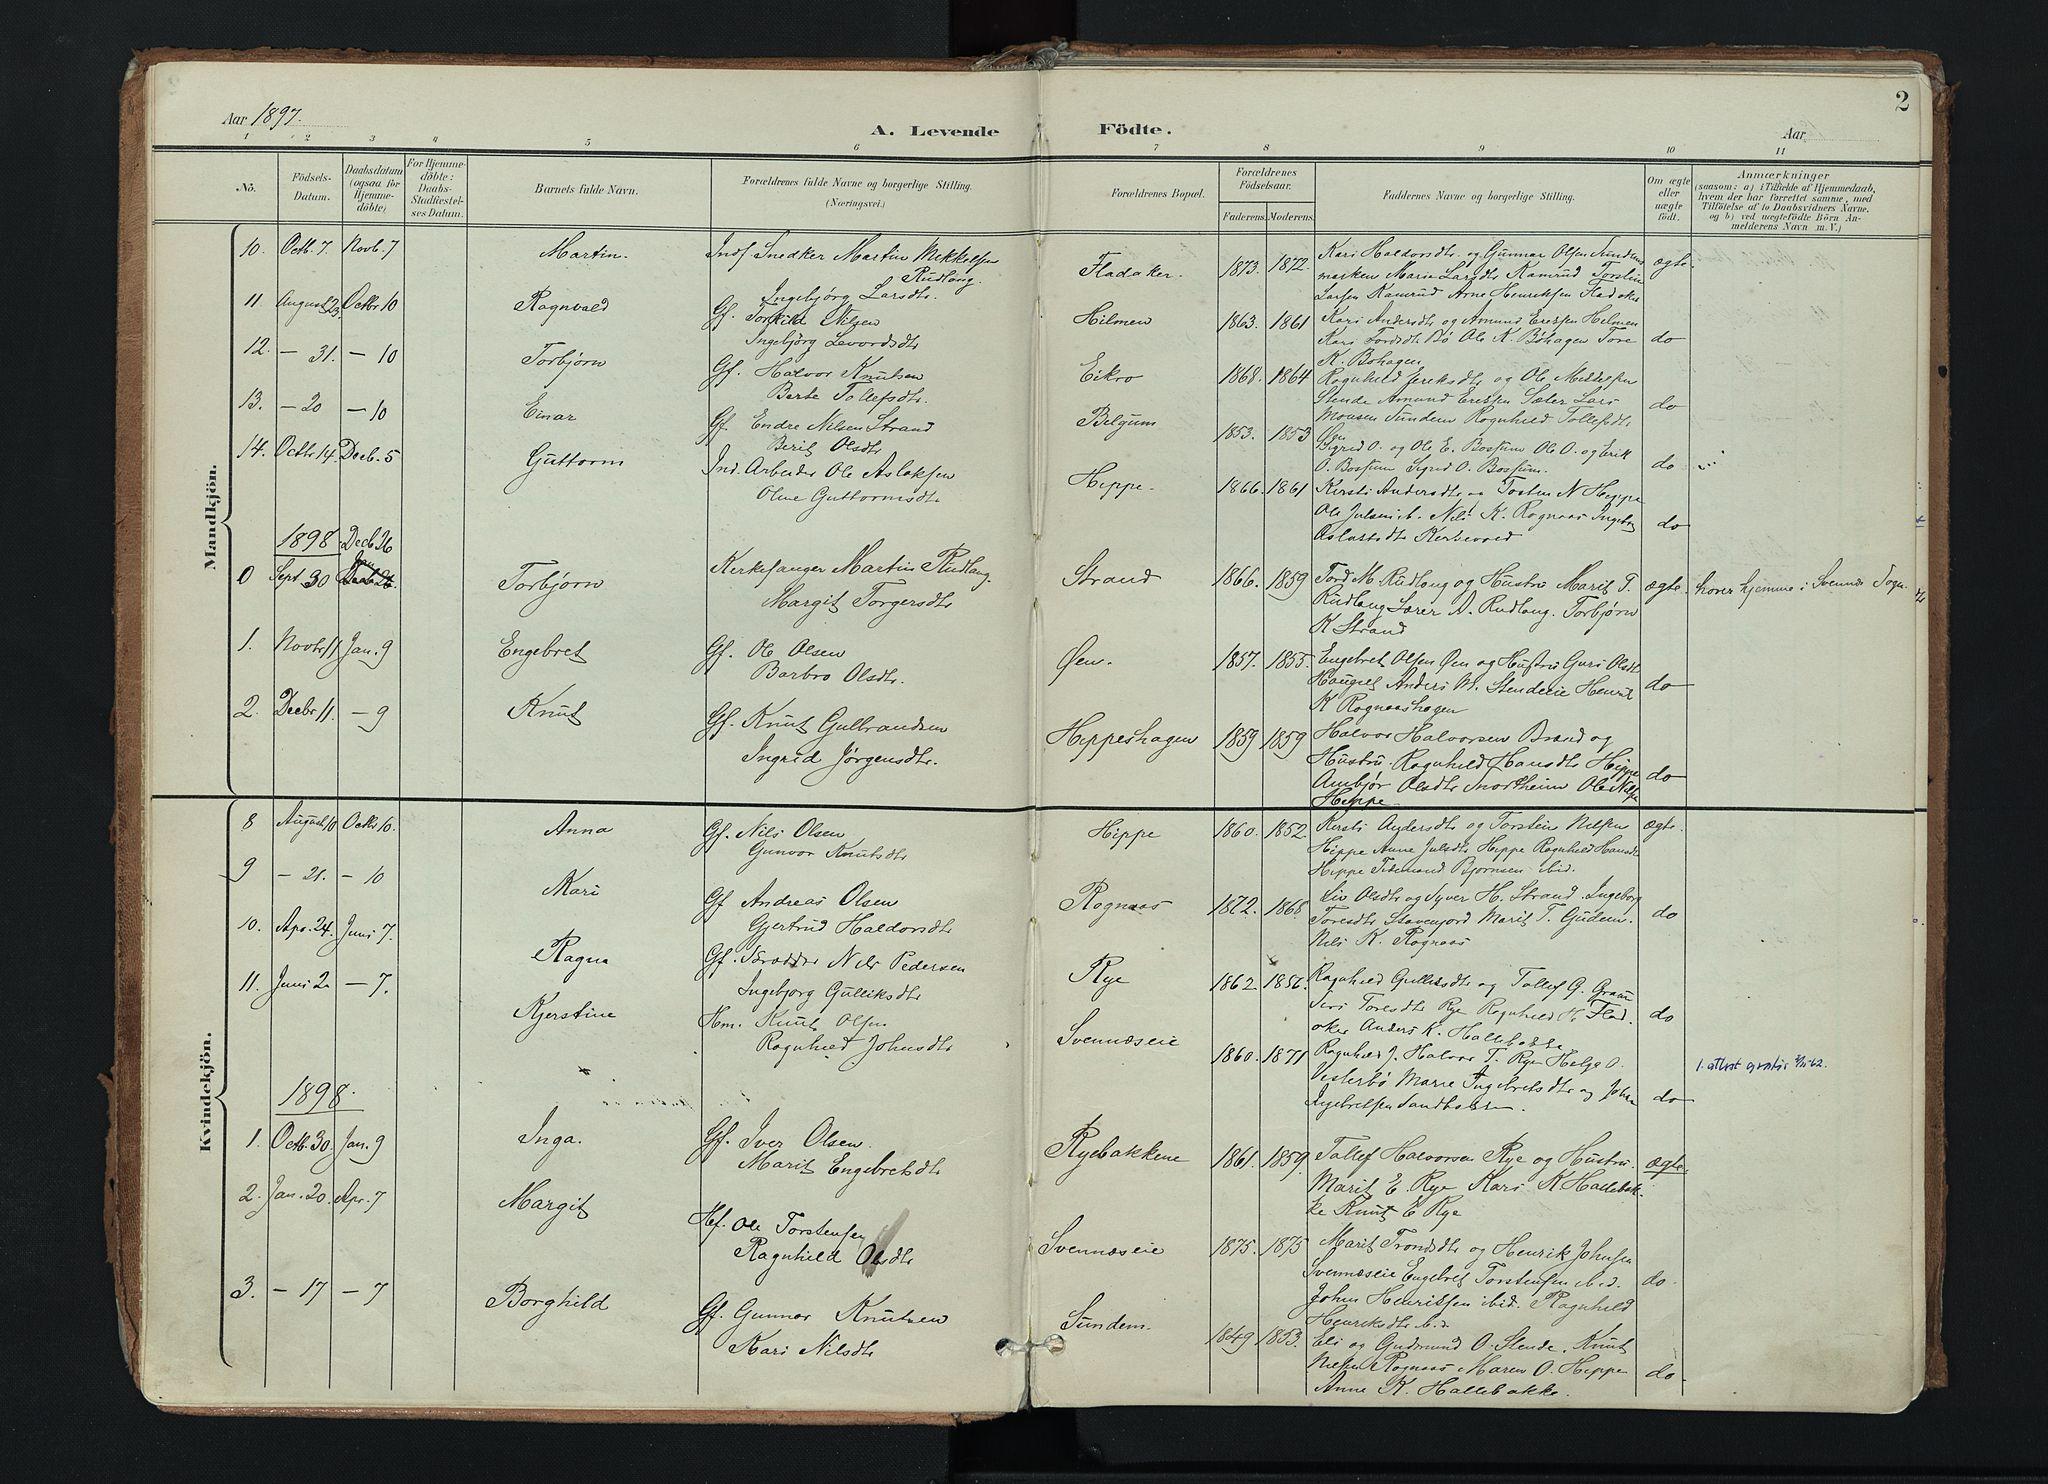 SAH, Nord-Aurdal prestekontor, Ministerialbok nr. 17, 1897-1926, s. 2